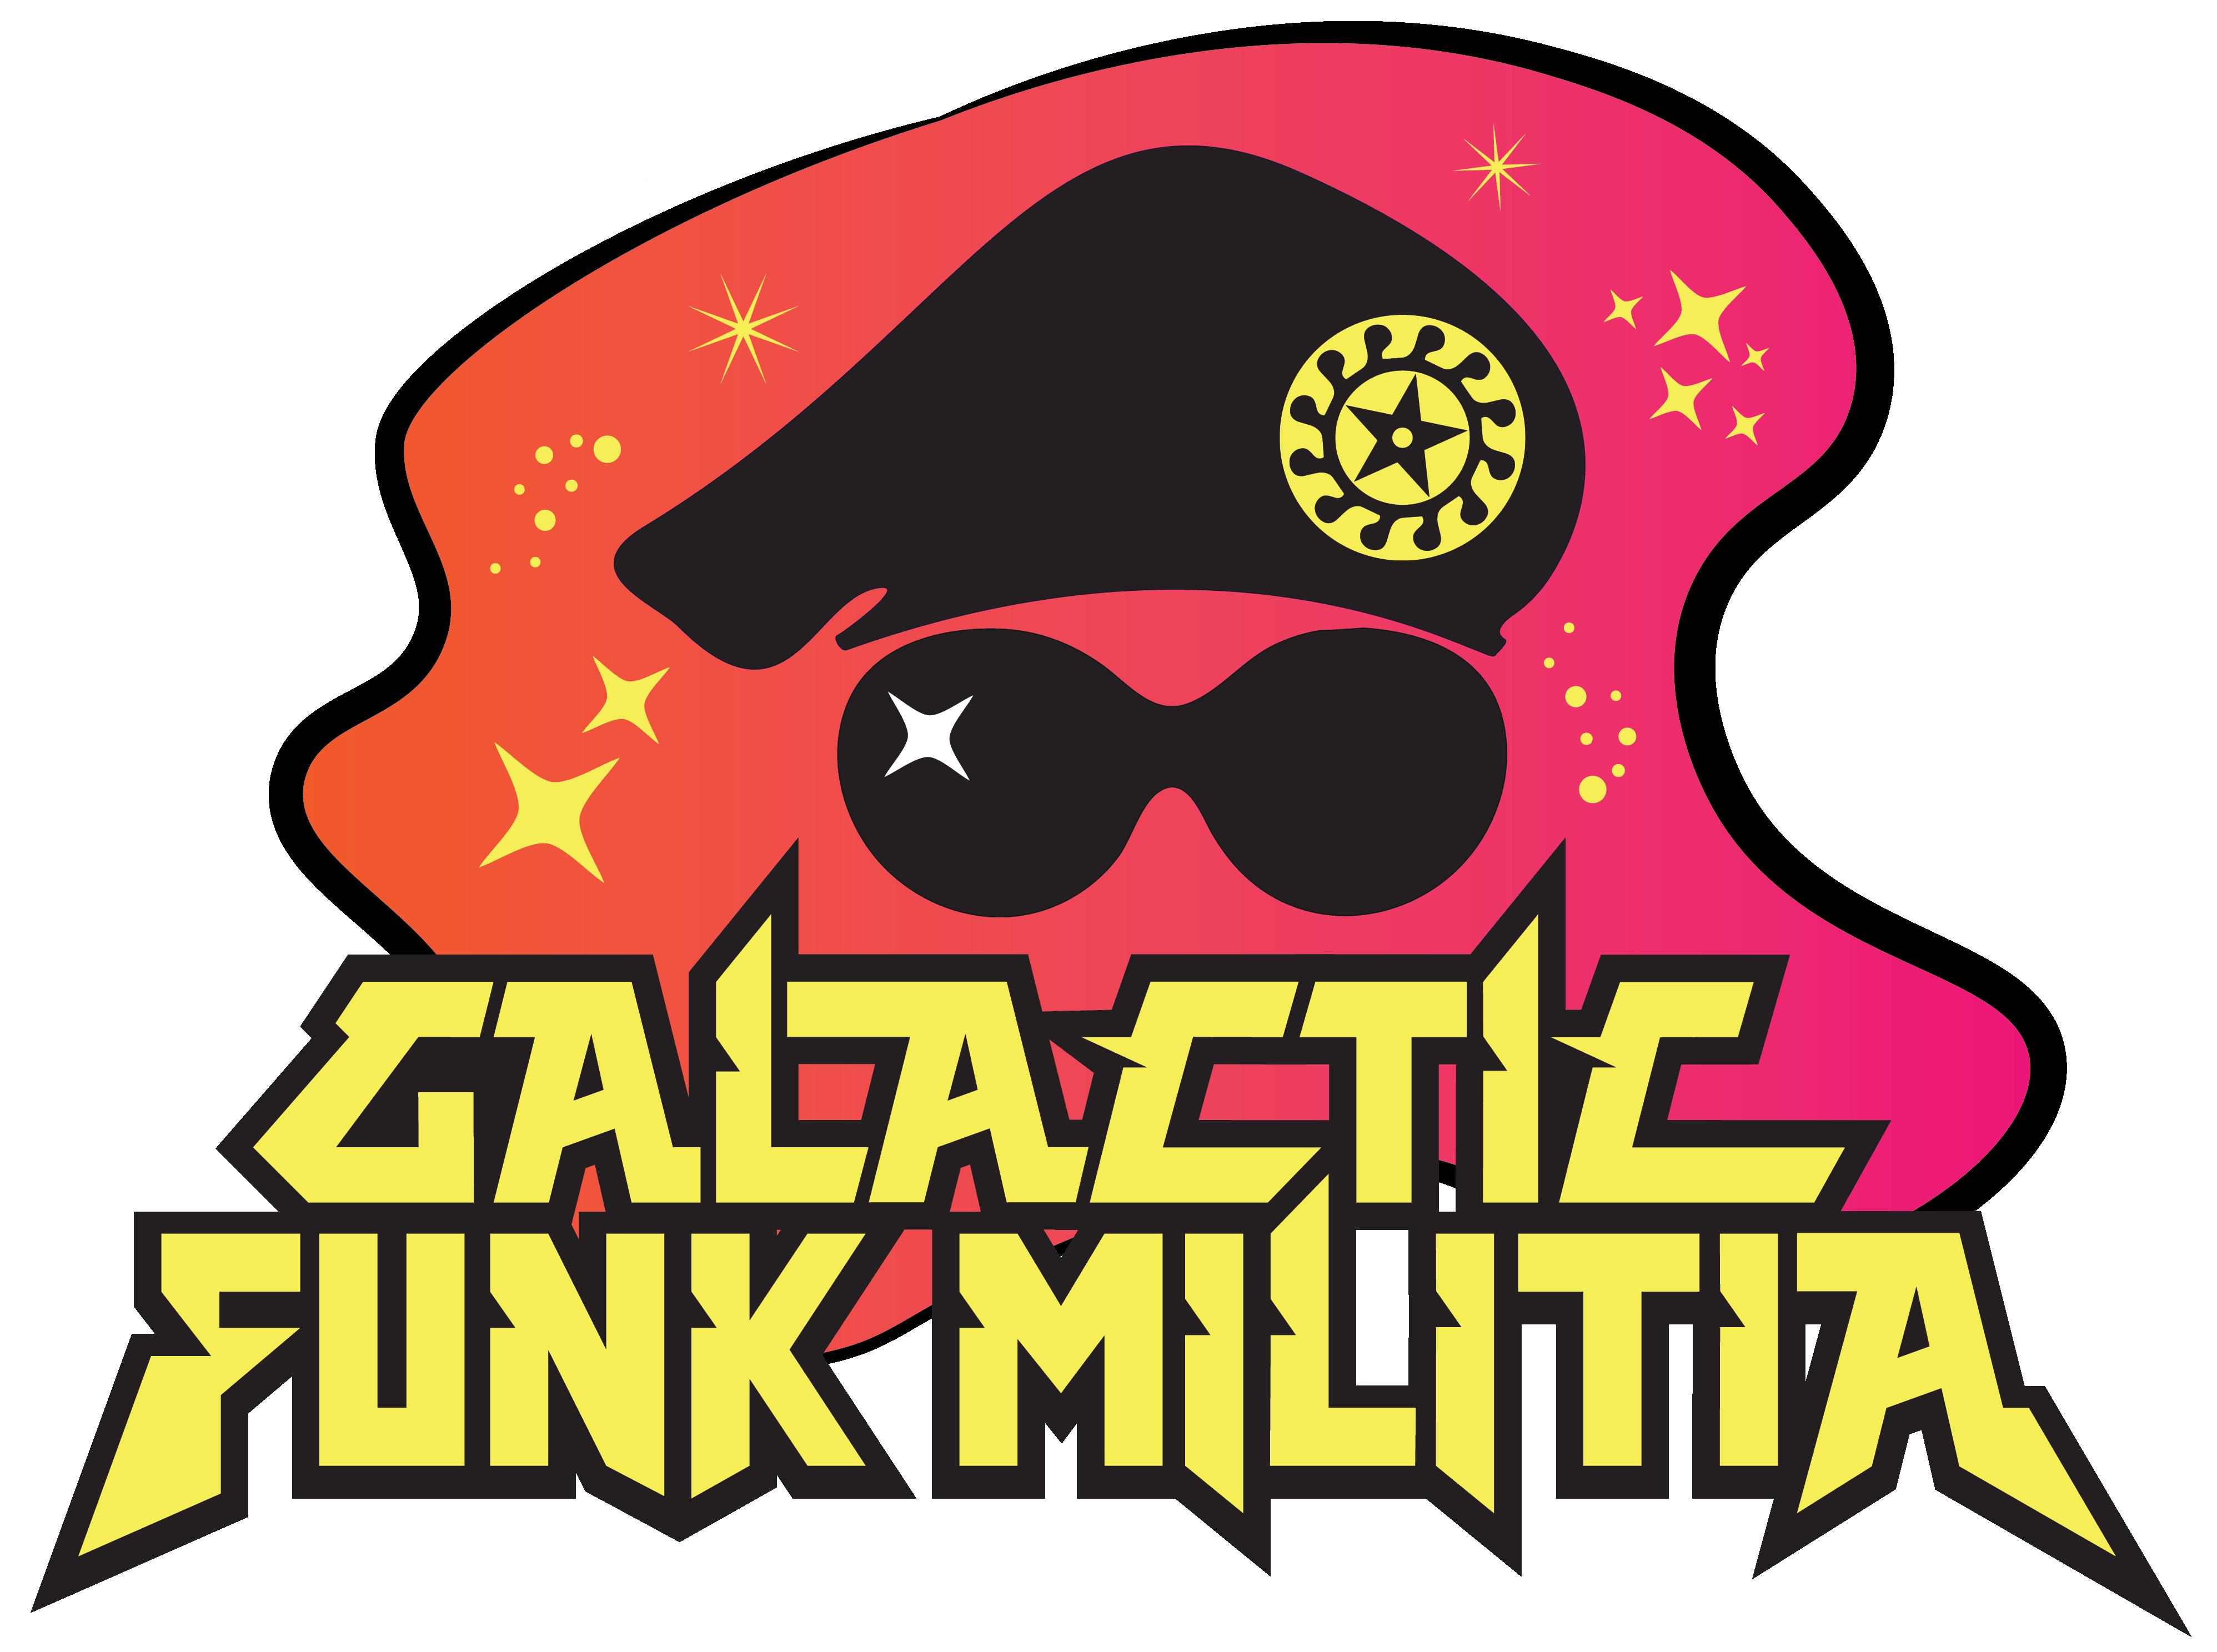 Galaxy clipart one armed. Galactic funk militia st